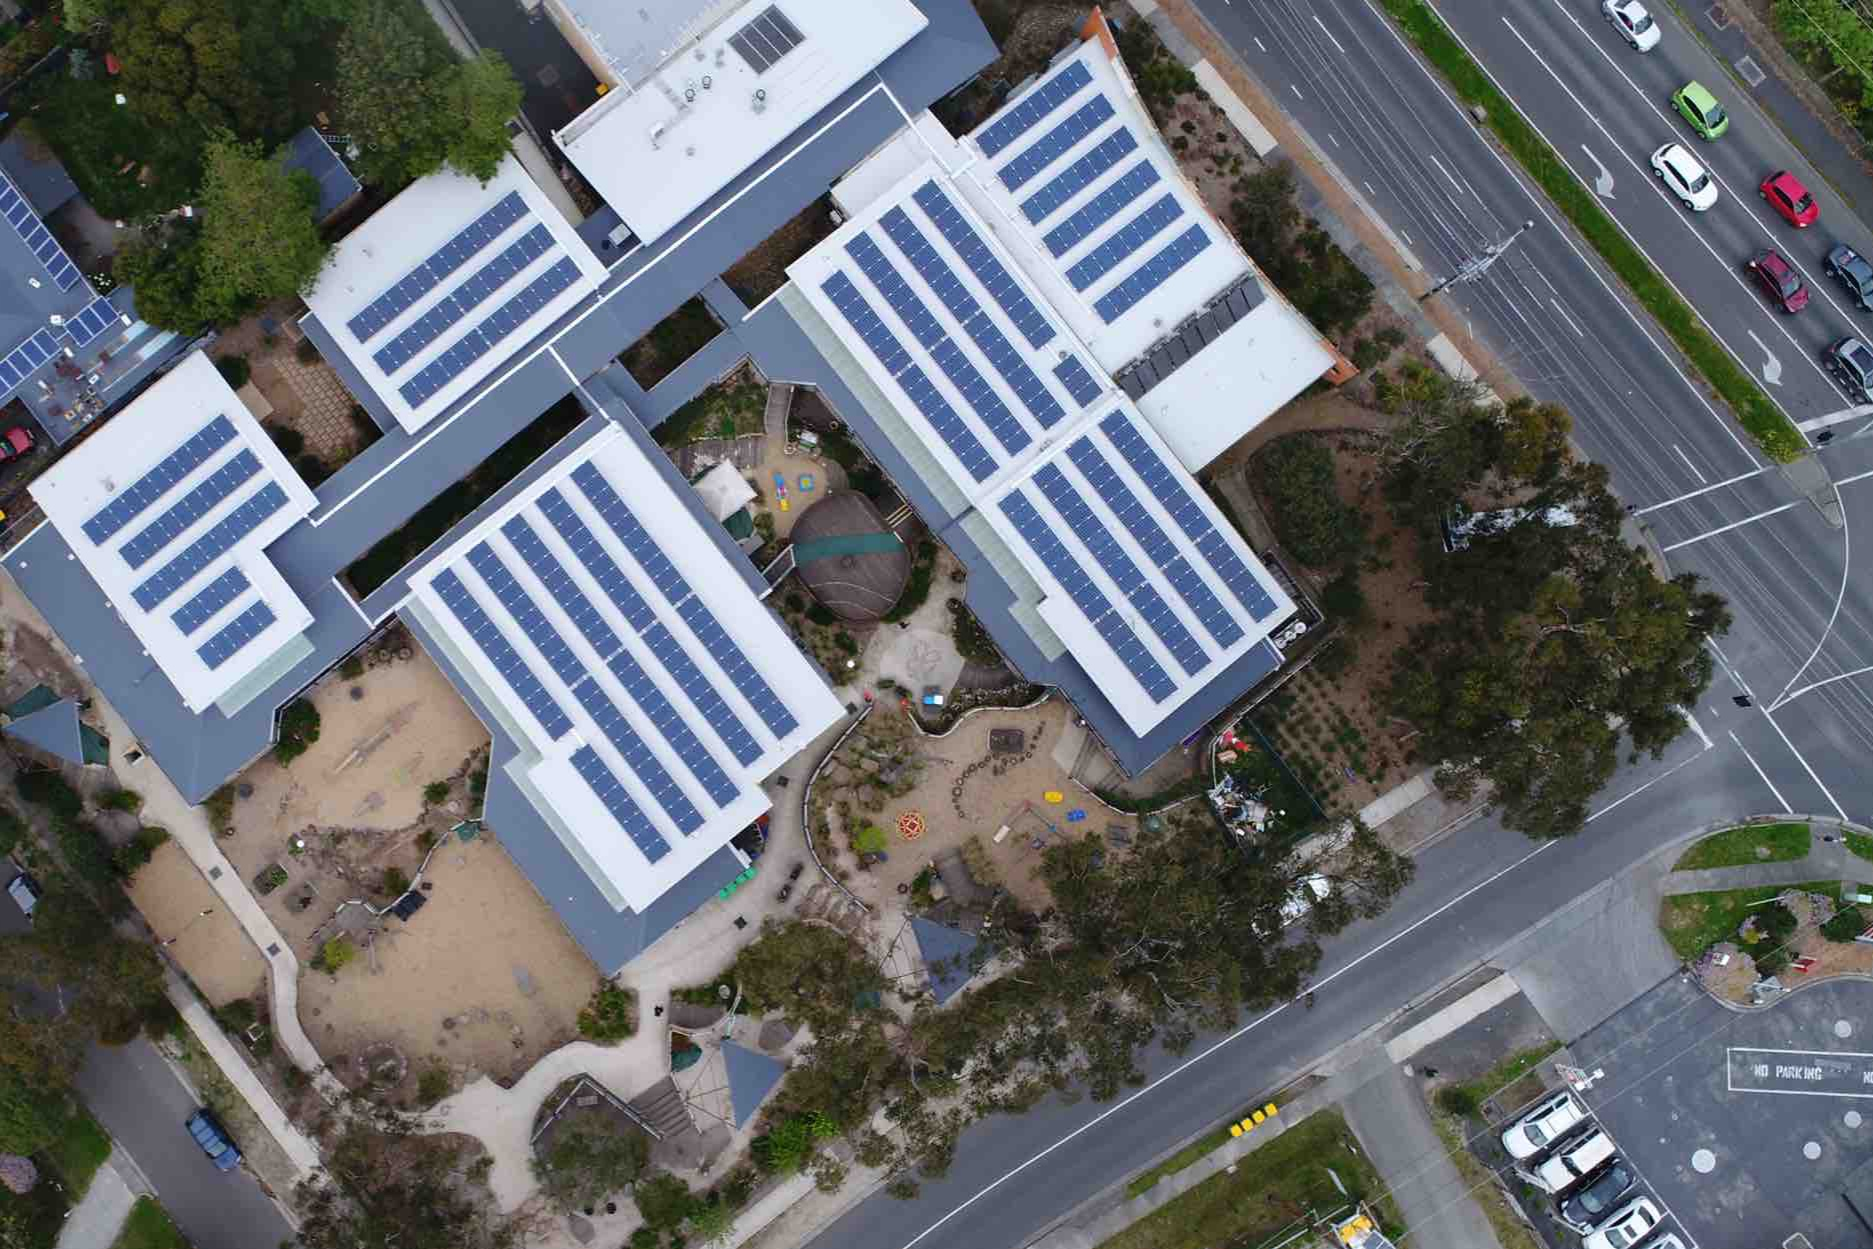 2017-18: 850KWP+ Yarra Ranges Shire Council - multiple sites